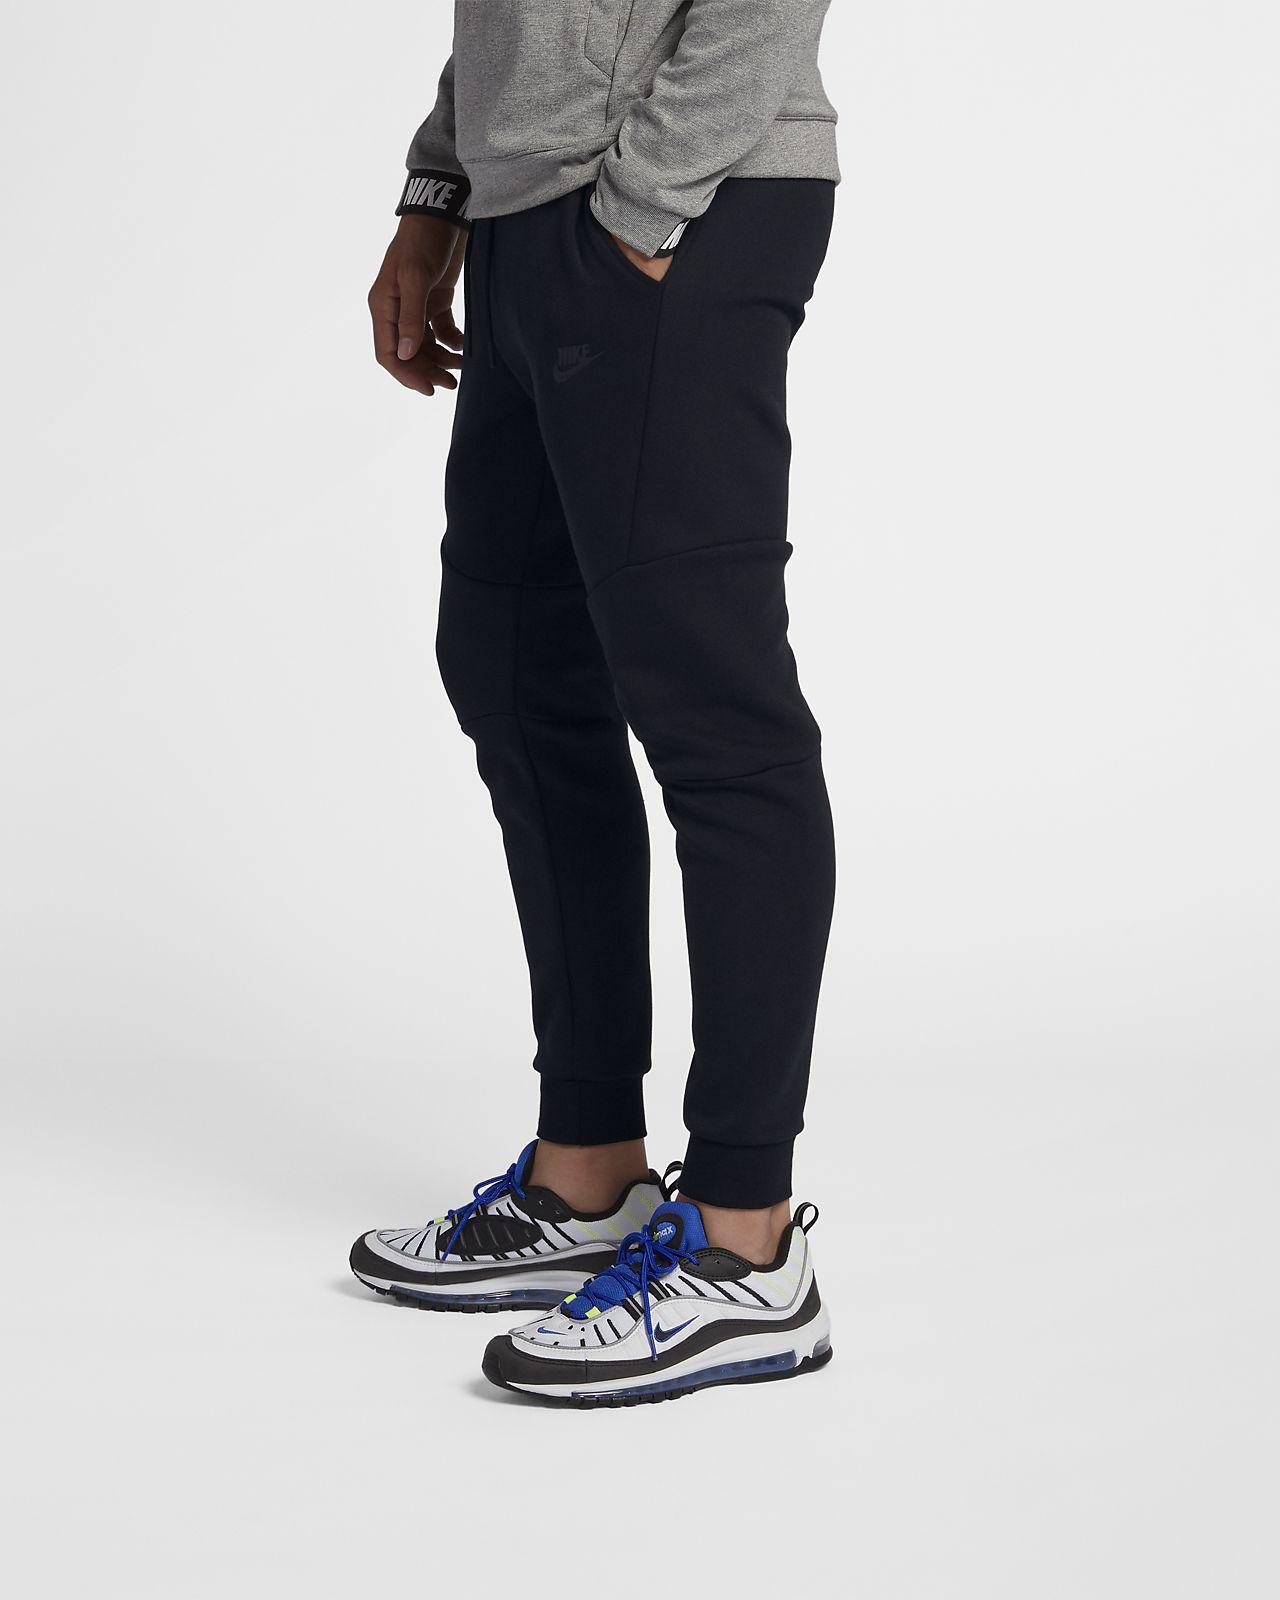 lace up in select for best amazing quality Nike Sportswear Tech Fleece Men's Joggers